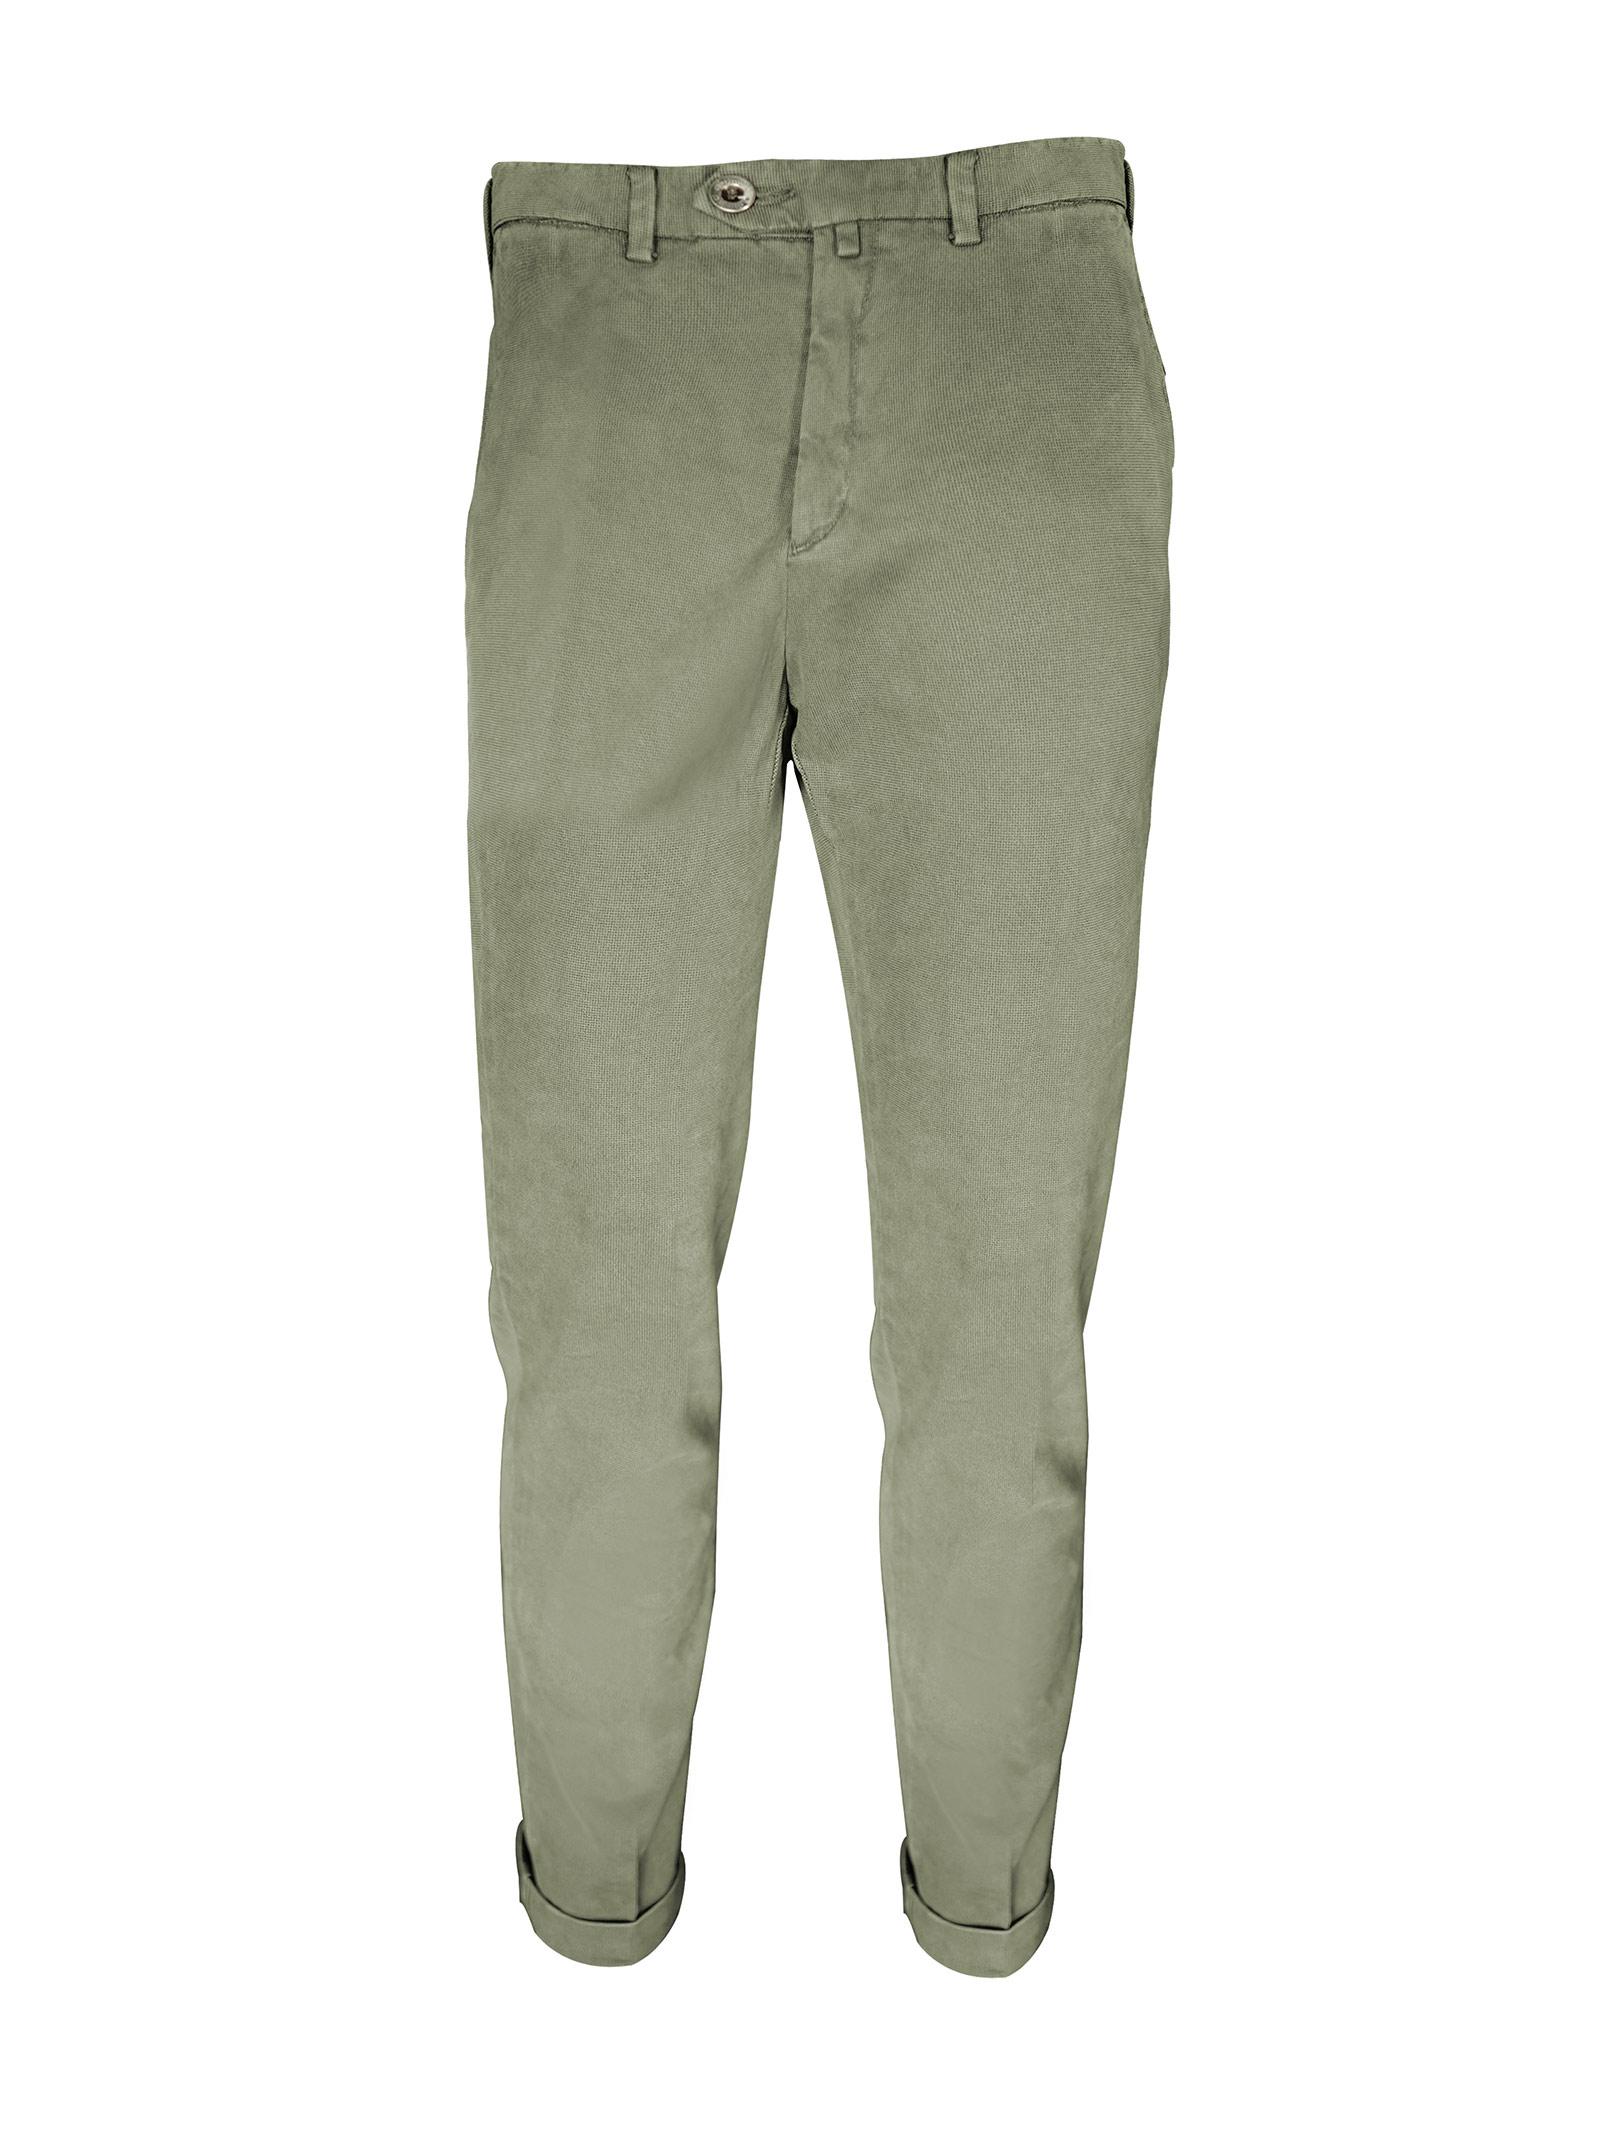 B700   Trousers   MH713 201043